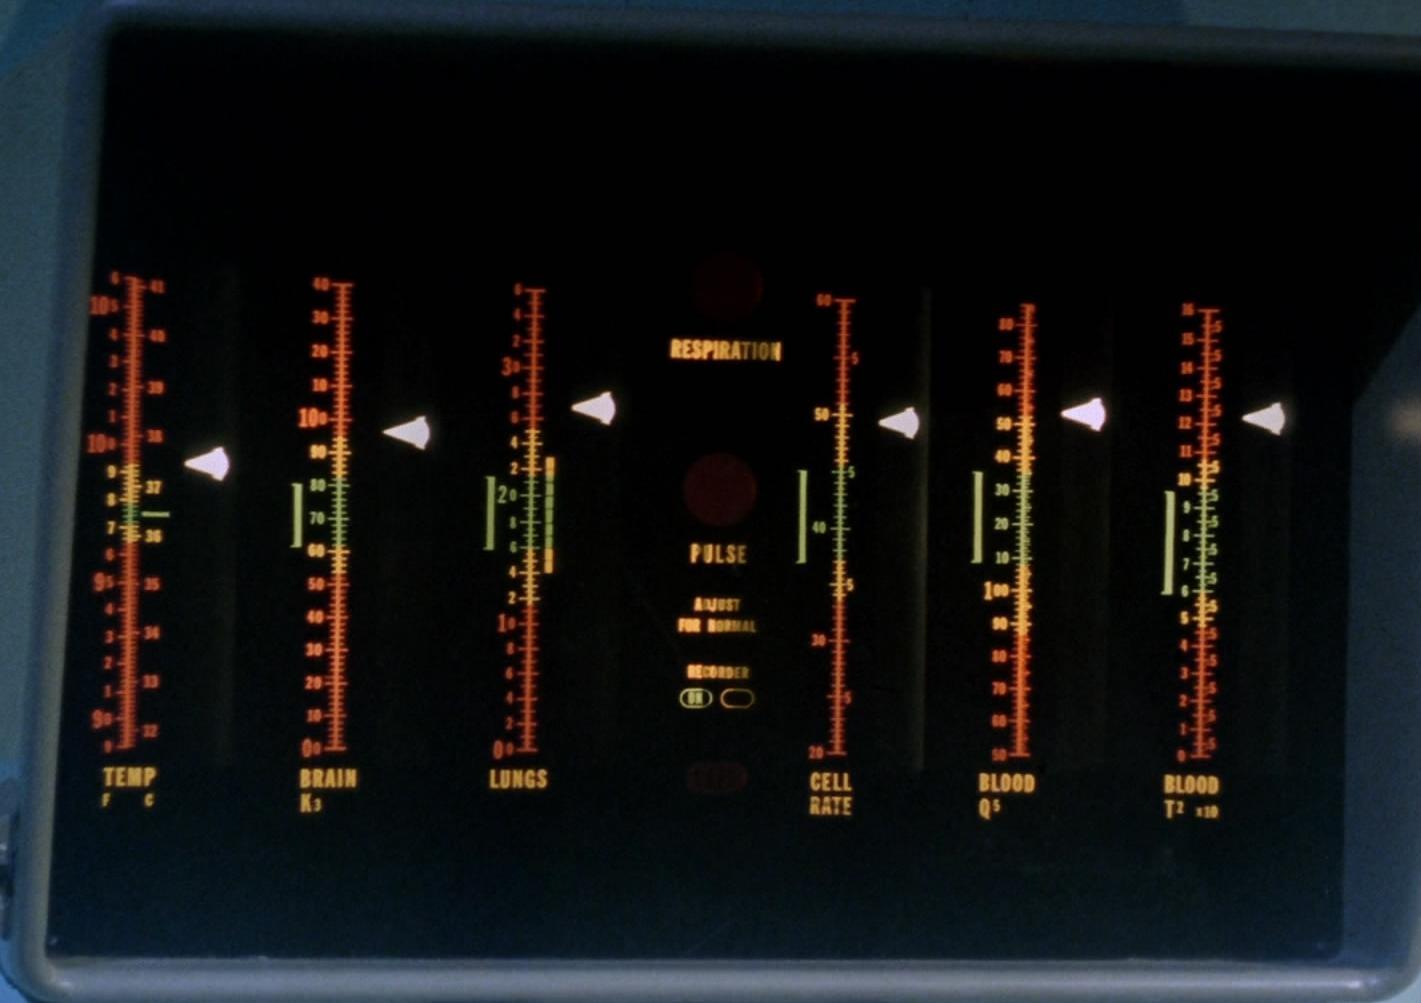 Biofunktionsmonitor